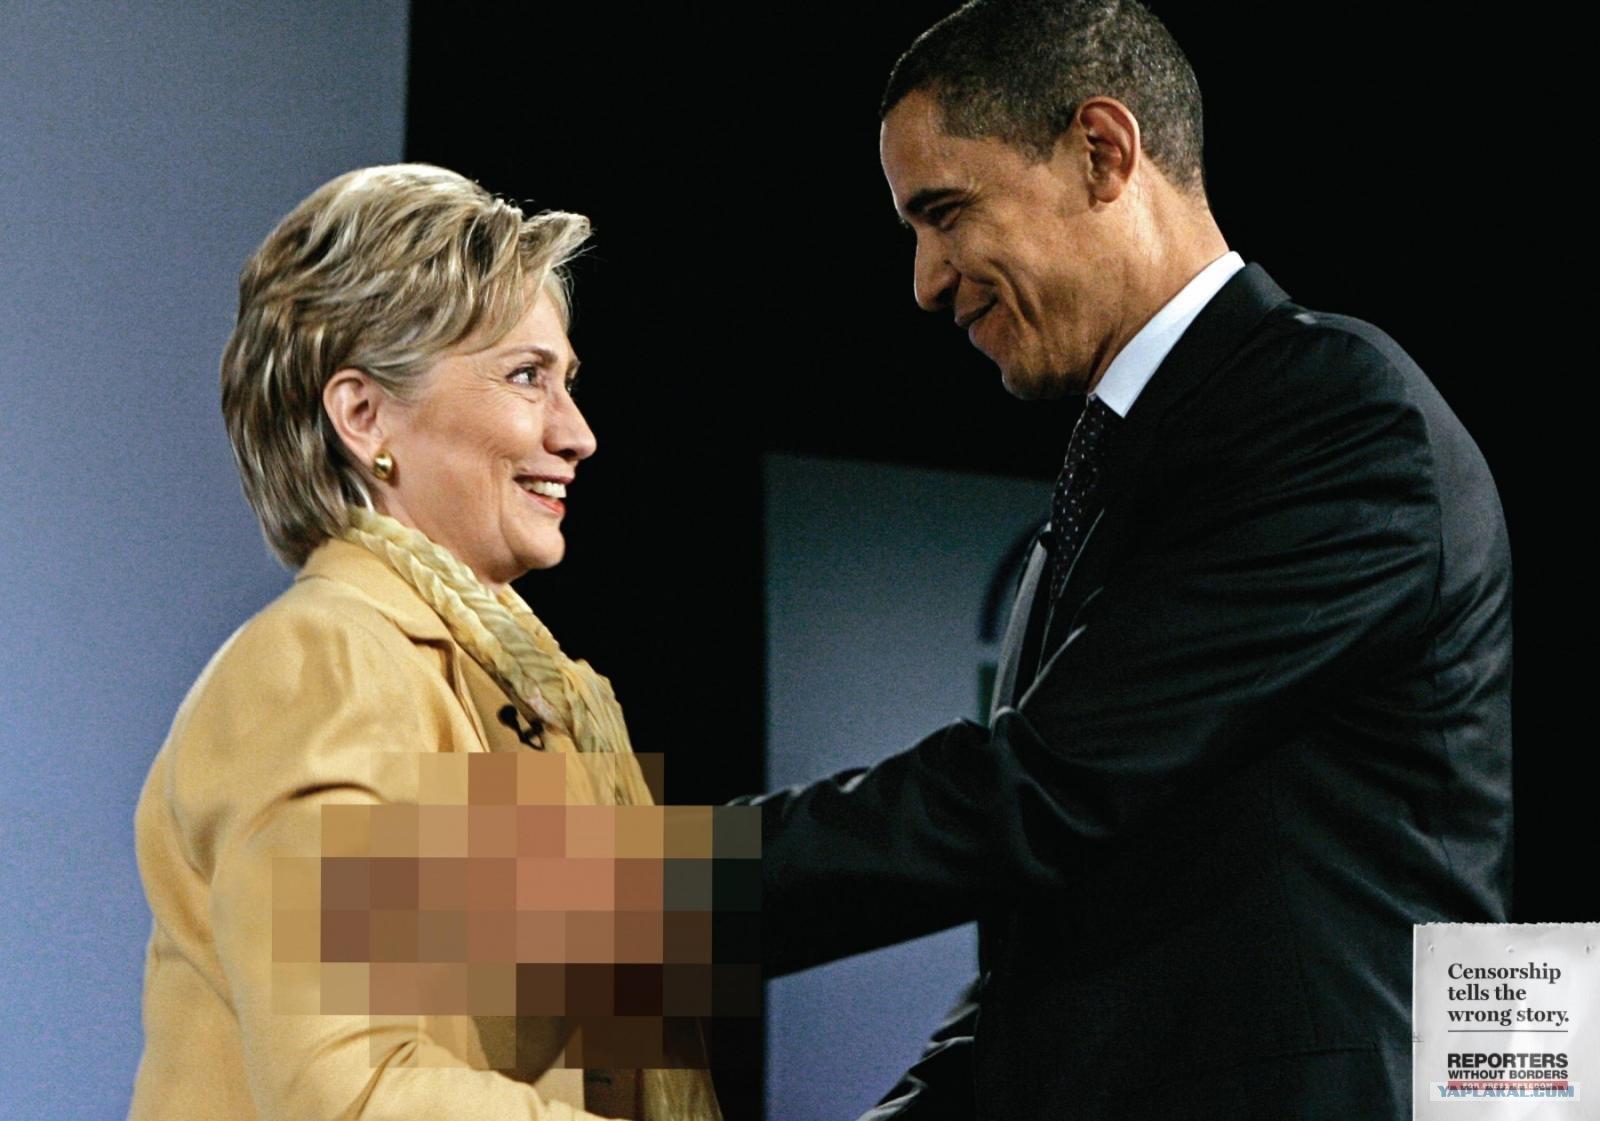 Цензура нет юа 2 фотография